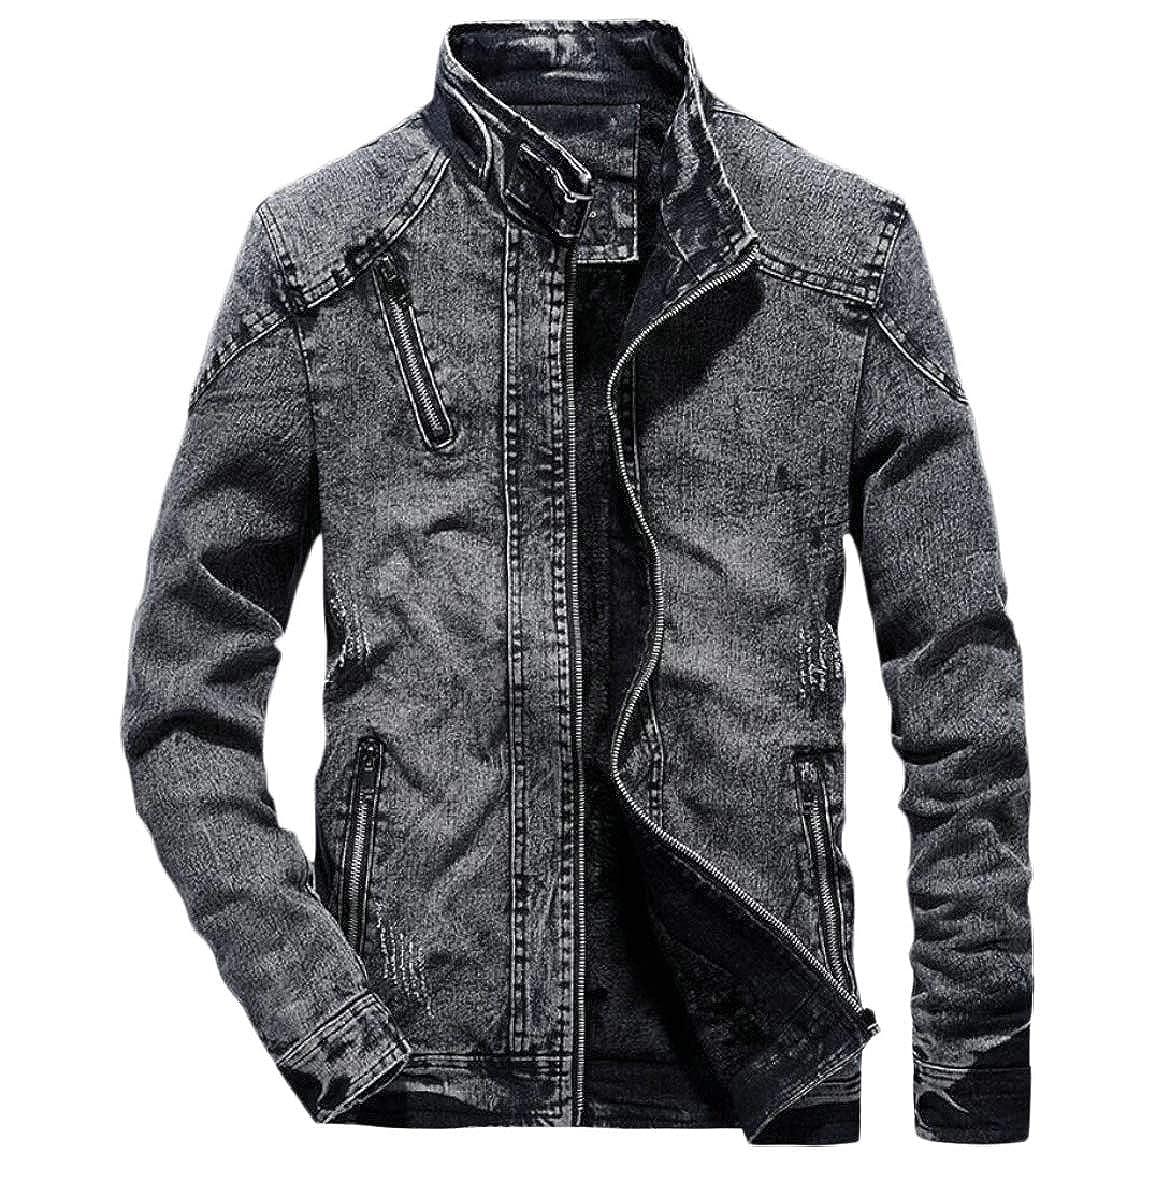 7bb7df600a Black Men's Slim Stand Stand Stand Collar Retro Long Sleeve Zipper Denim  Jackets 6bd512